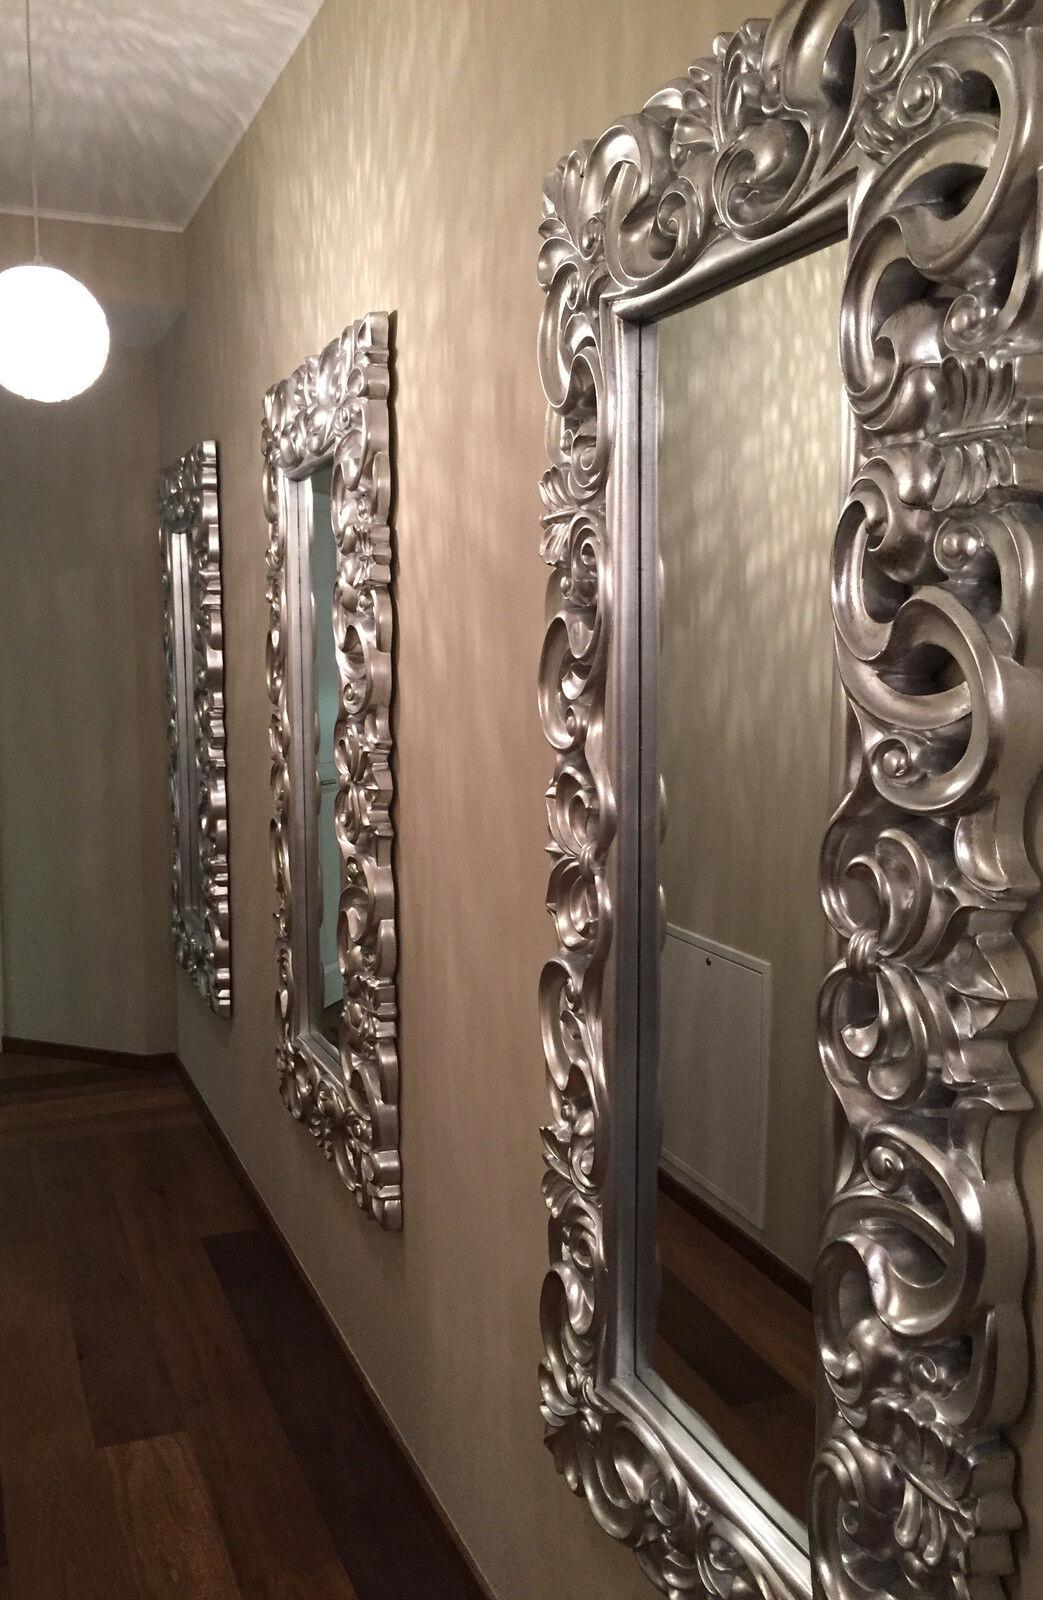 xxl wandspiegel spiegel repro barock antik rechteckig. Black Bedroom Furniture Sets. Home Design Ideas